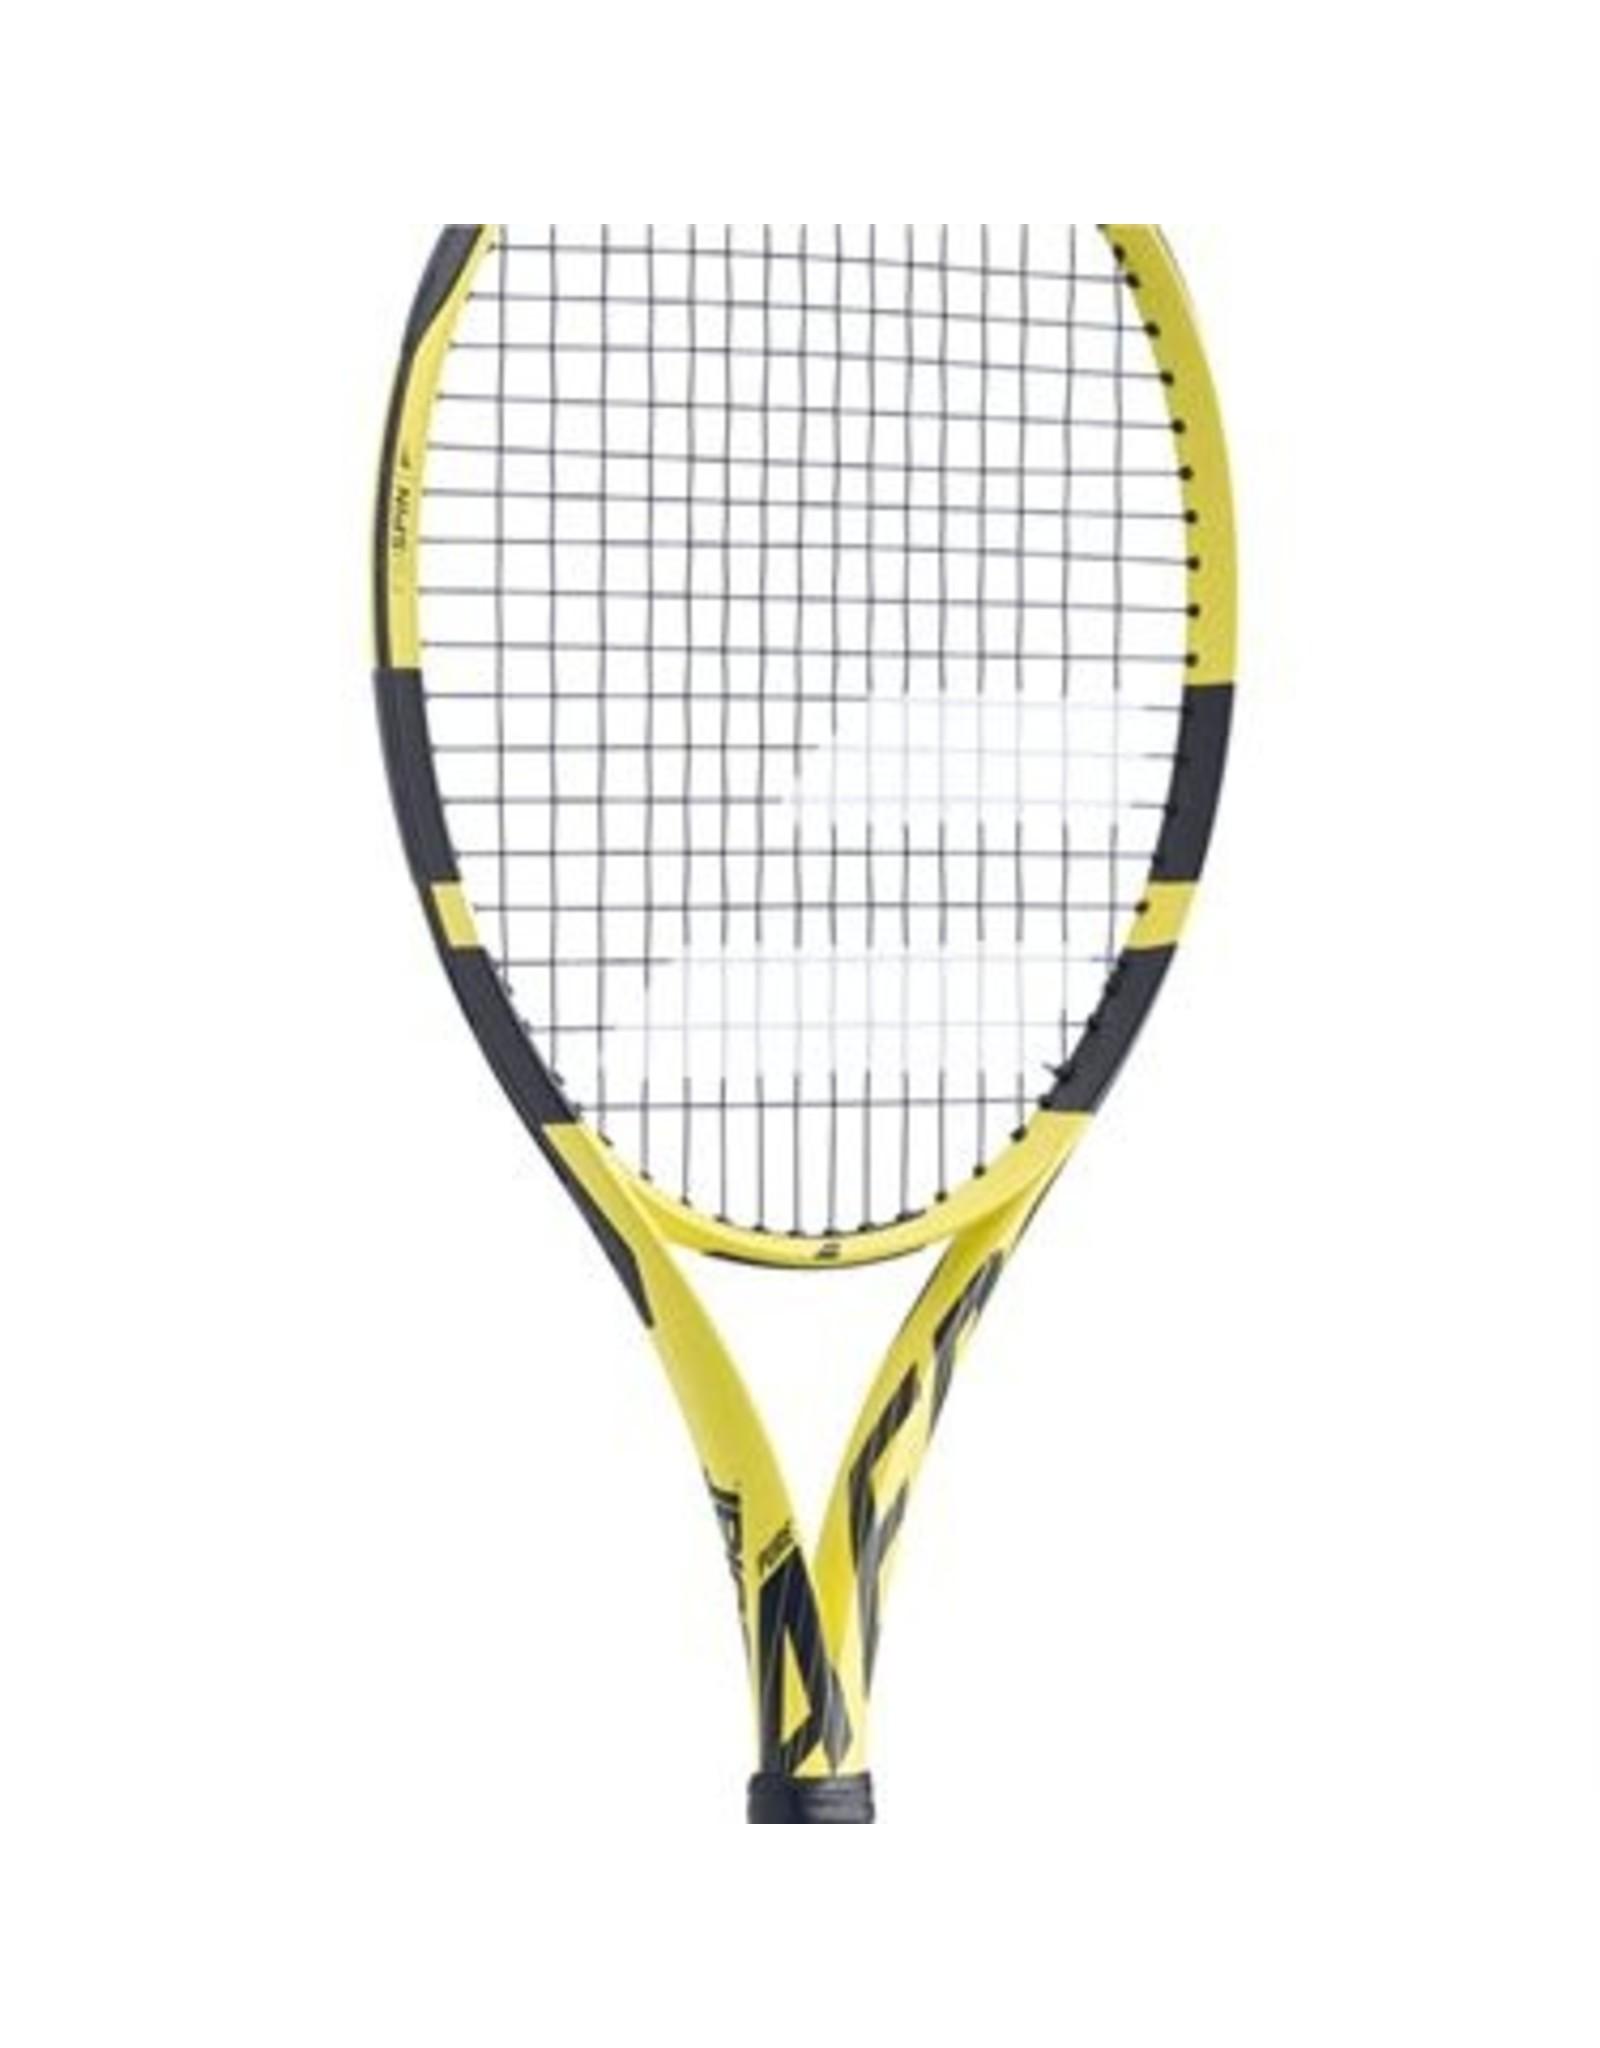 Babolat Babolat Pure Aero Plus Tennis Racquet